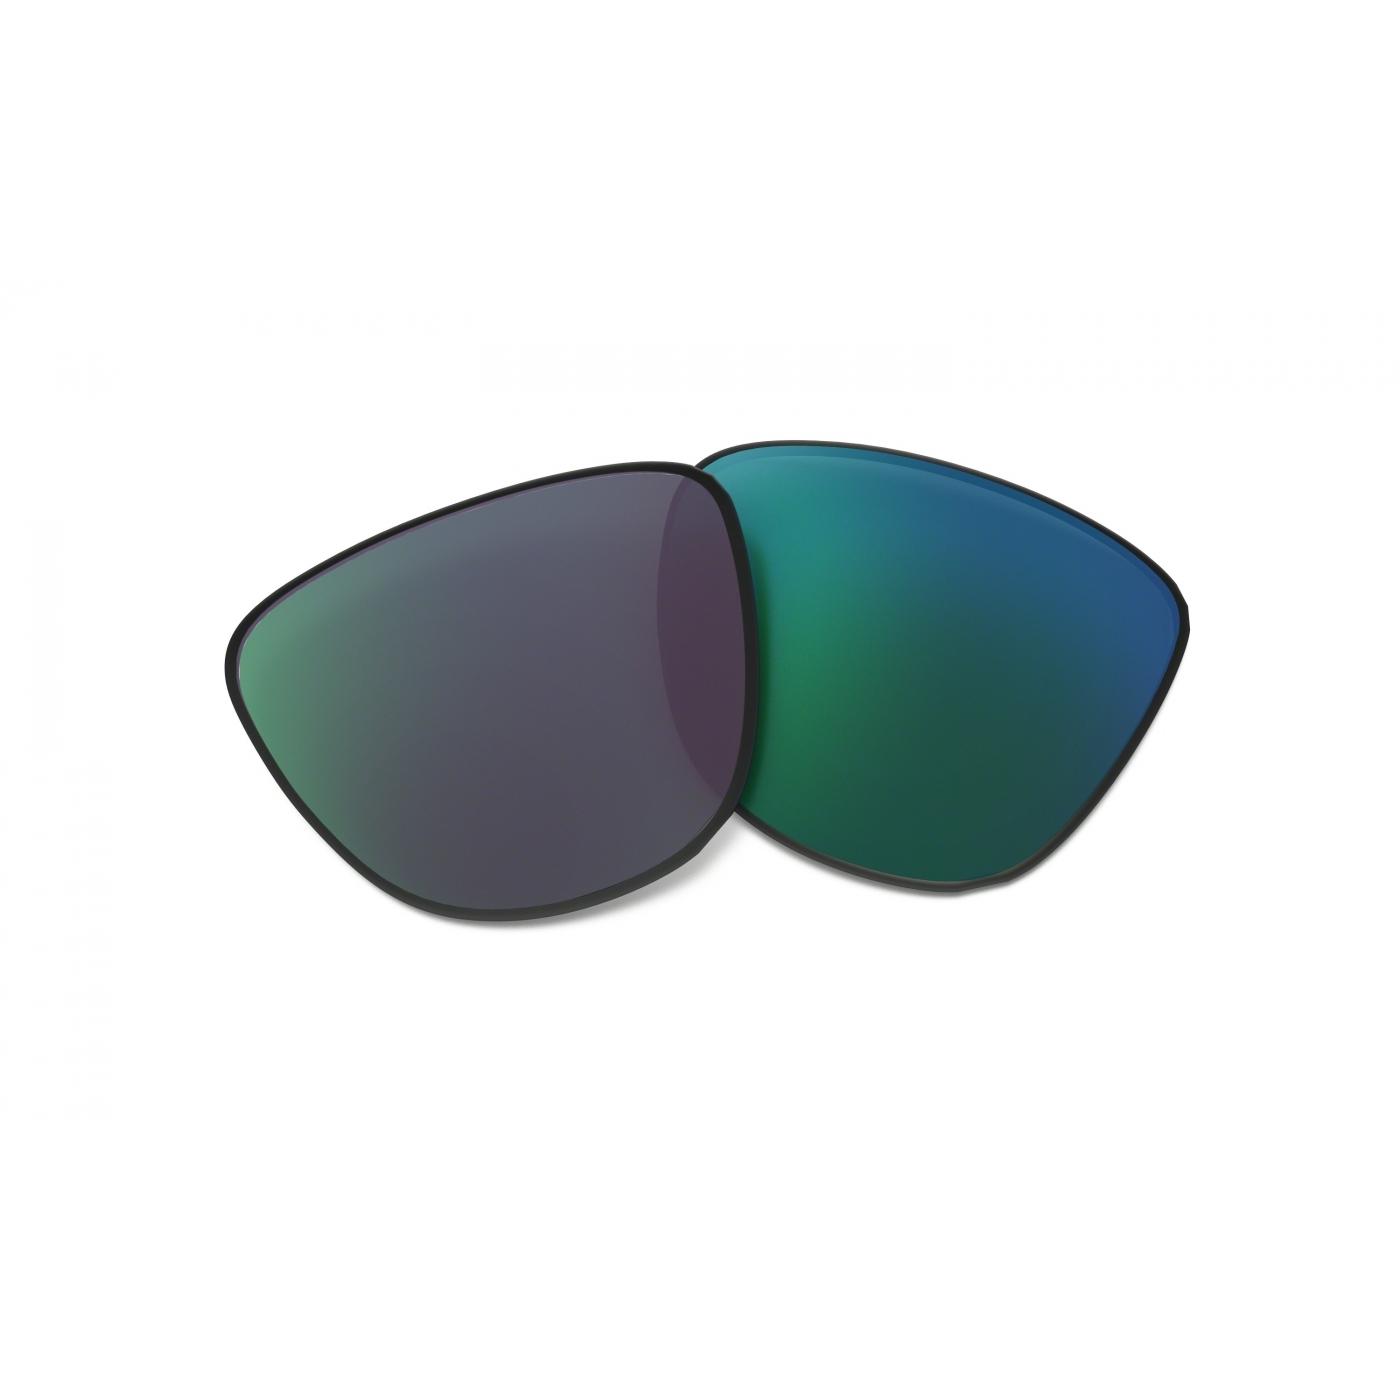 836946a1b523c Verres Oakley Frogskins Repl Lens Jade Iridium